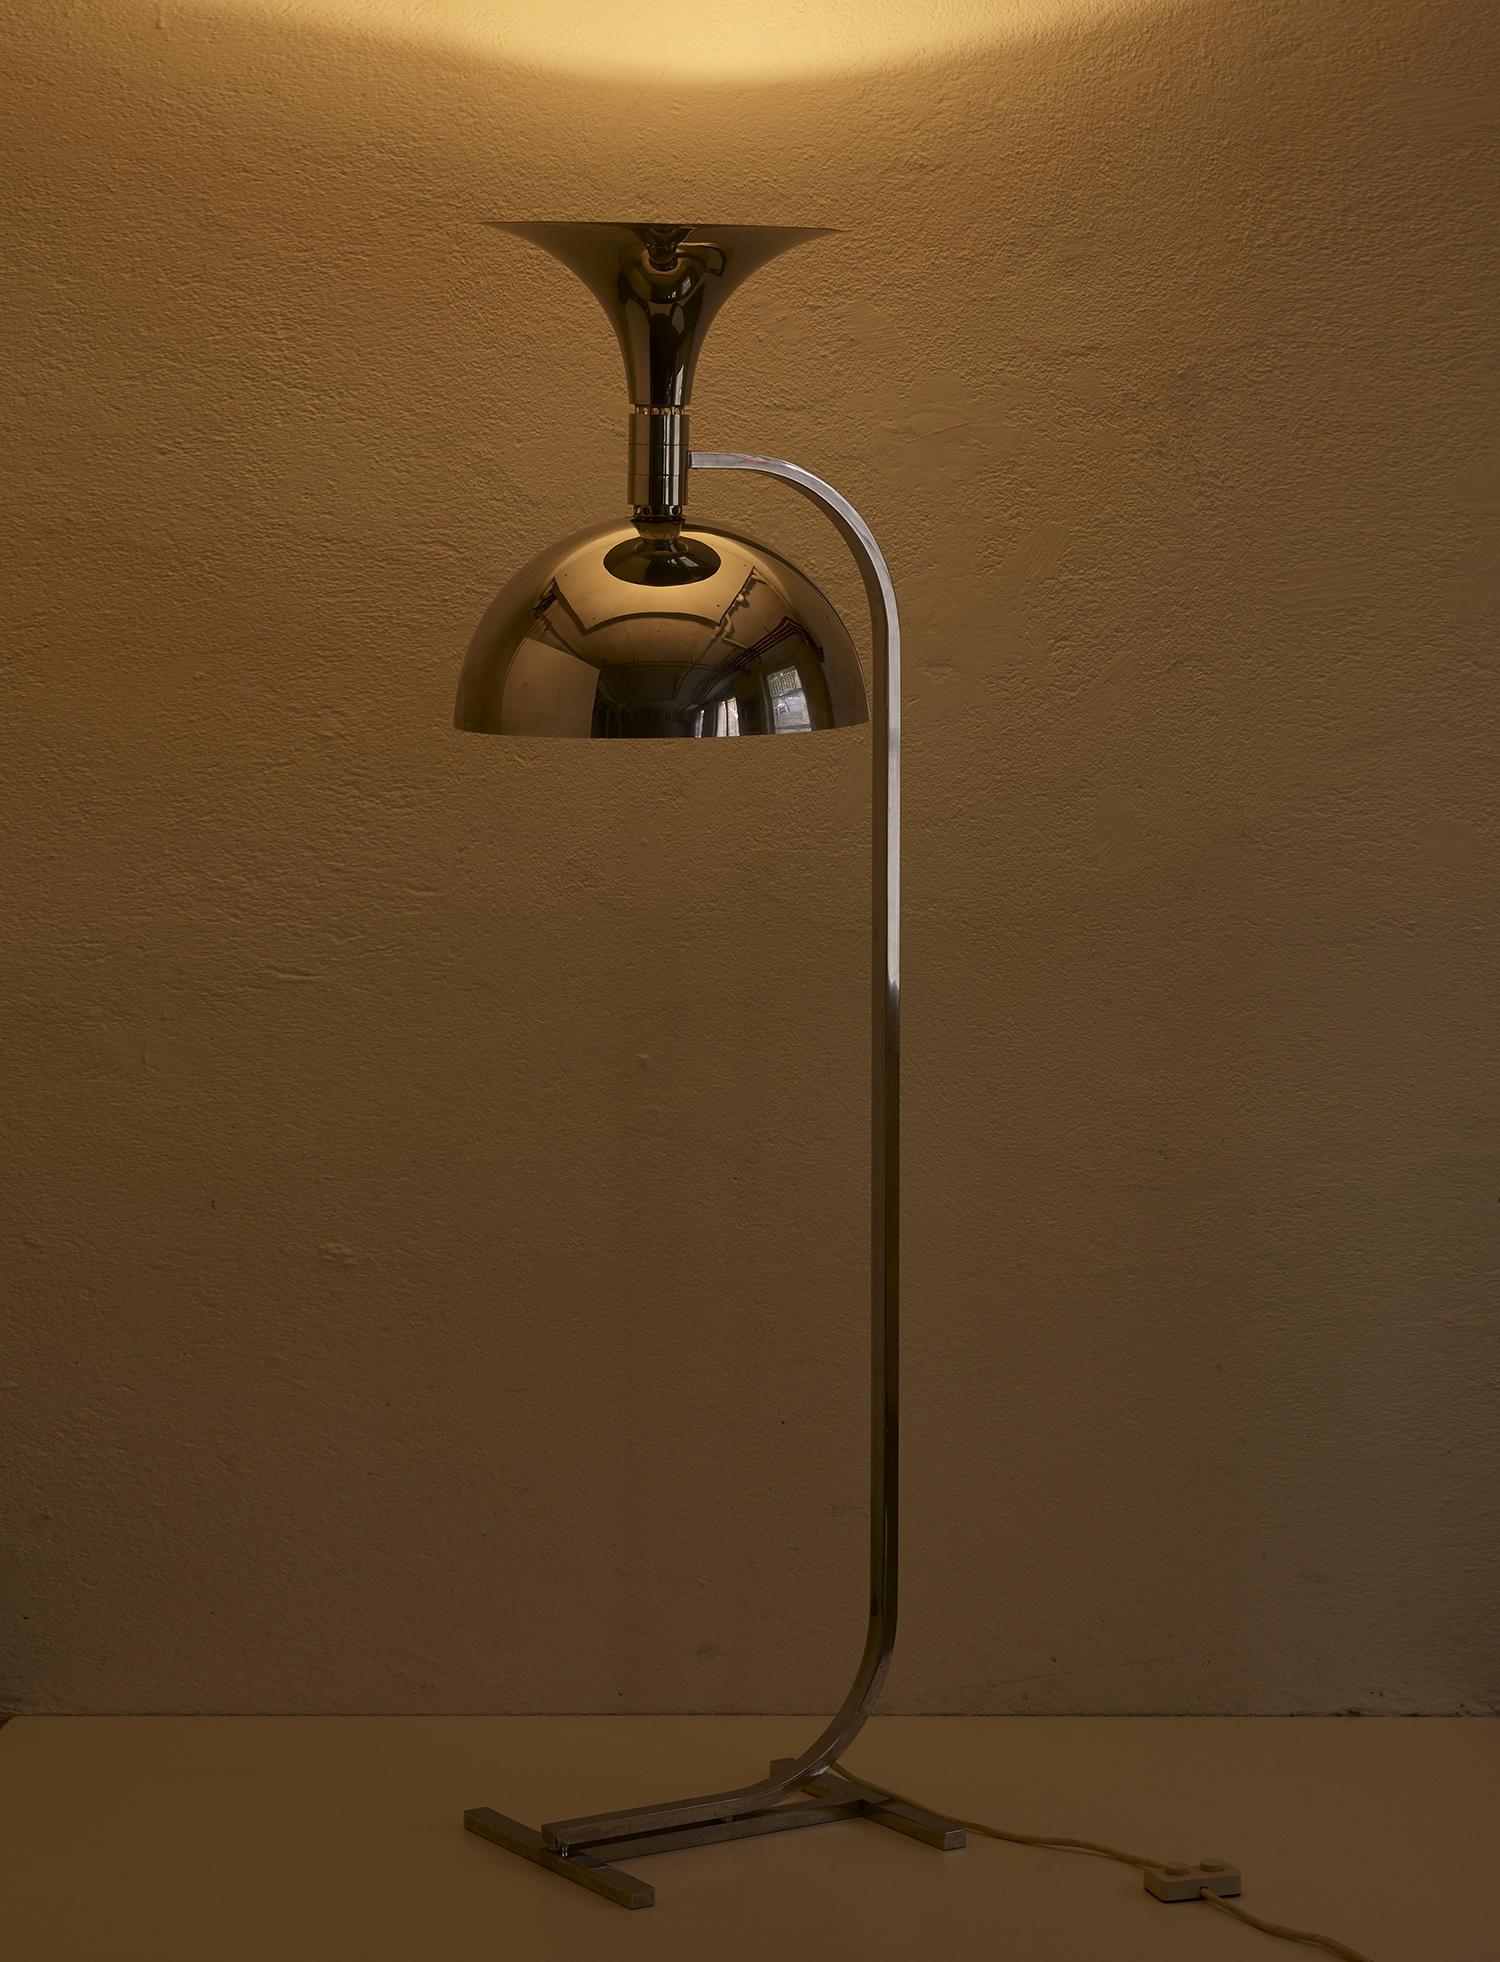 lampe-de-sol-de-franca-helg-et-franco-albini-1969-image-02